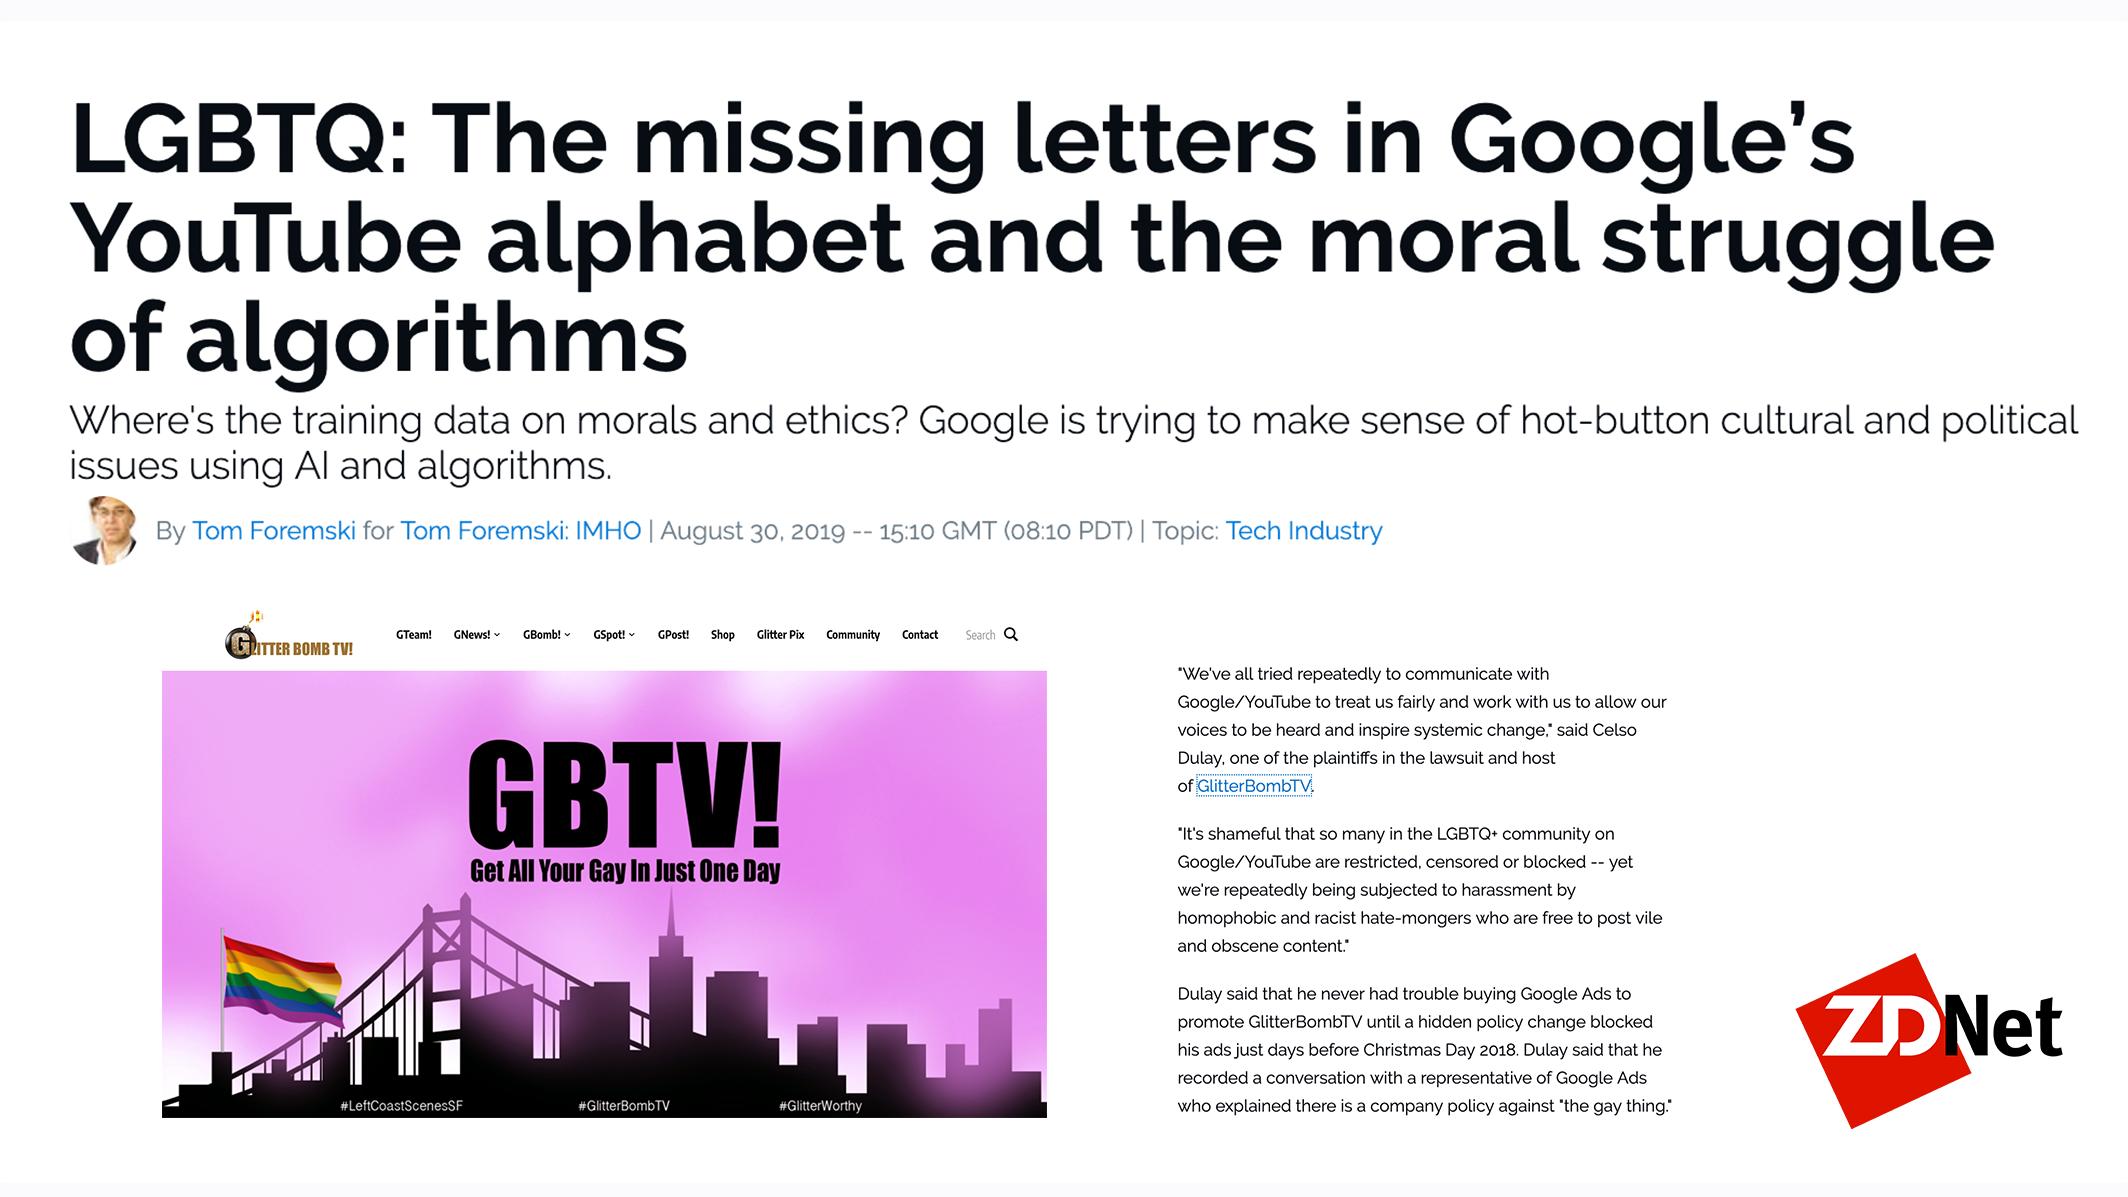 Tom's story on LGBTQs vs. Google